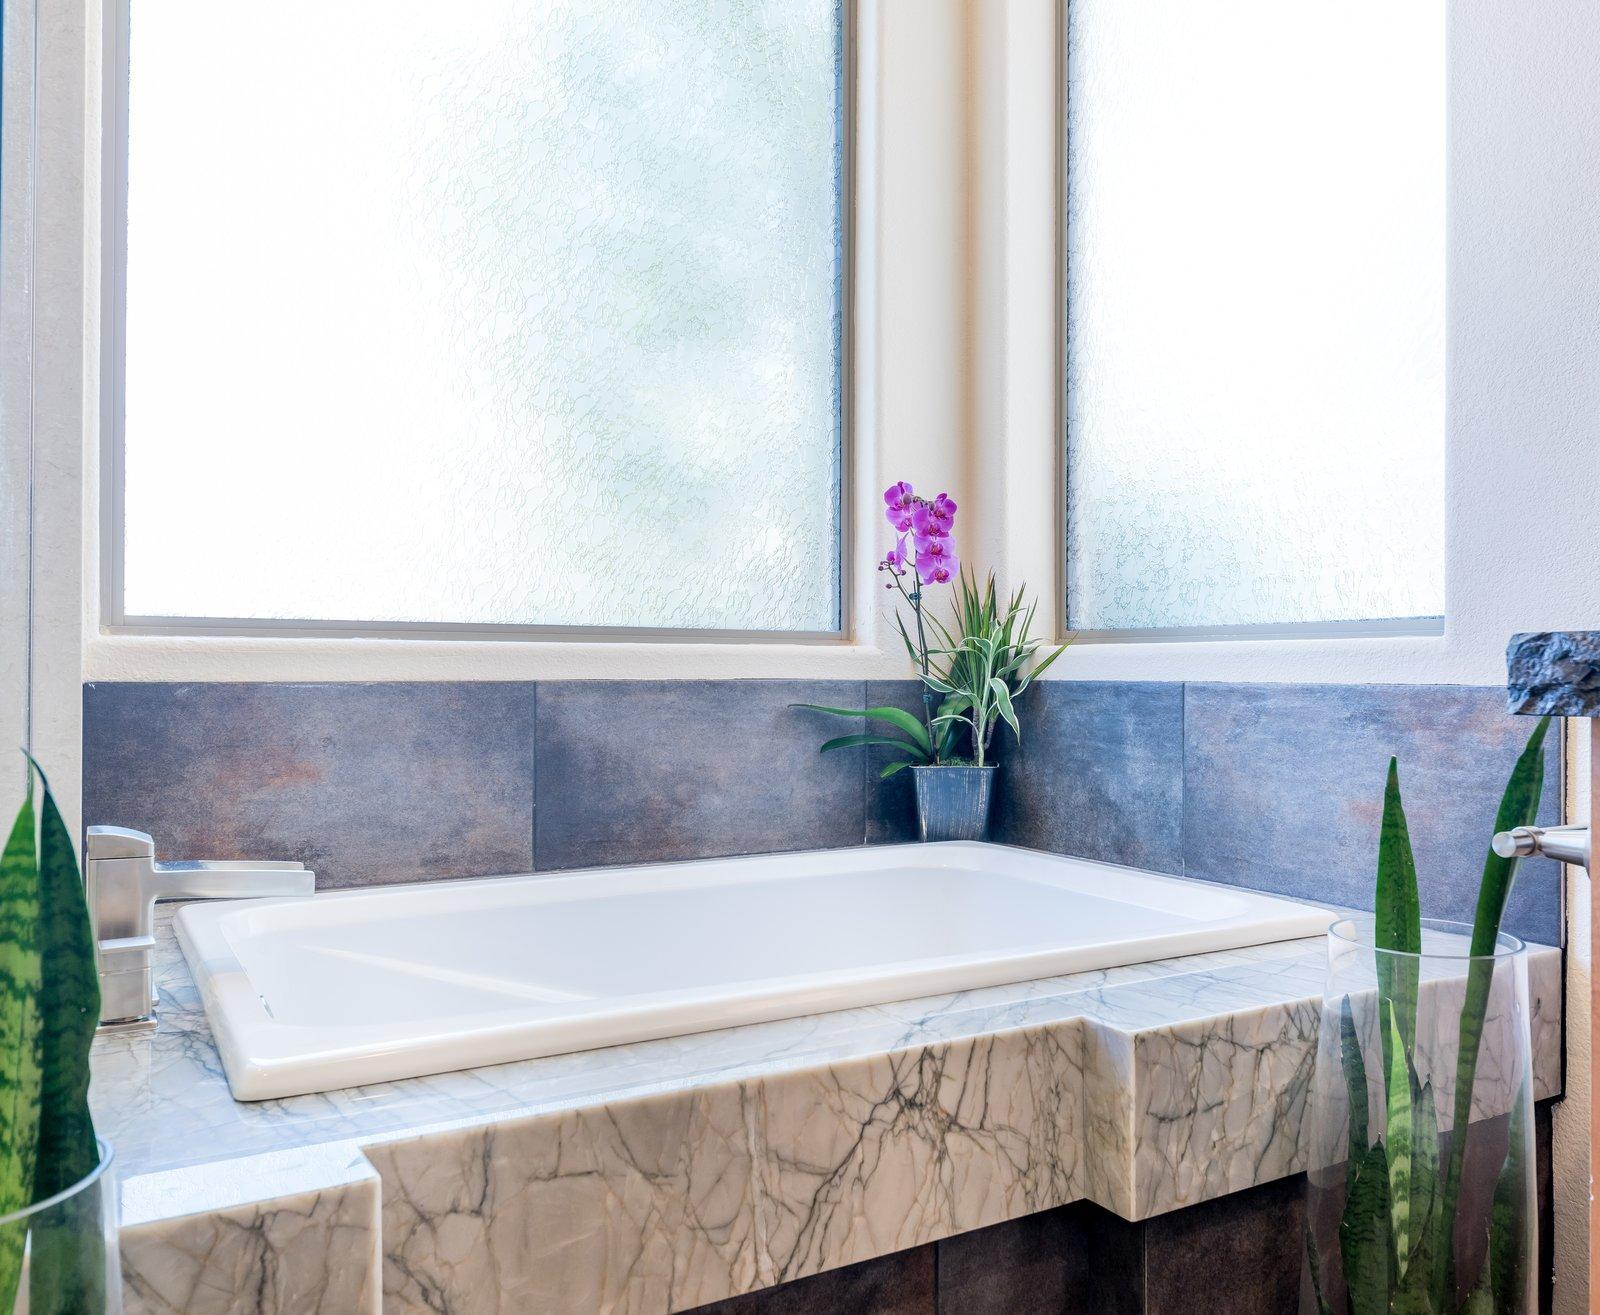 Bath Room, Engineered Quartz Counter, and Porcelain Tile Floor  Spa Escape